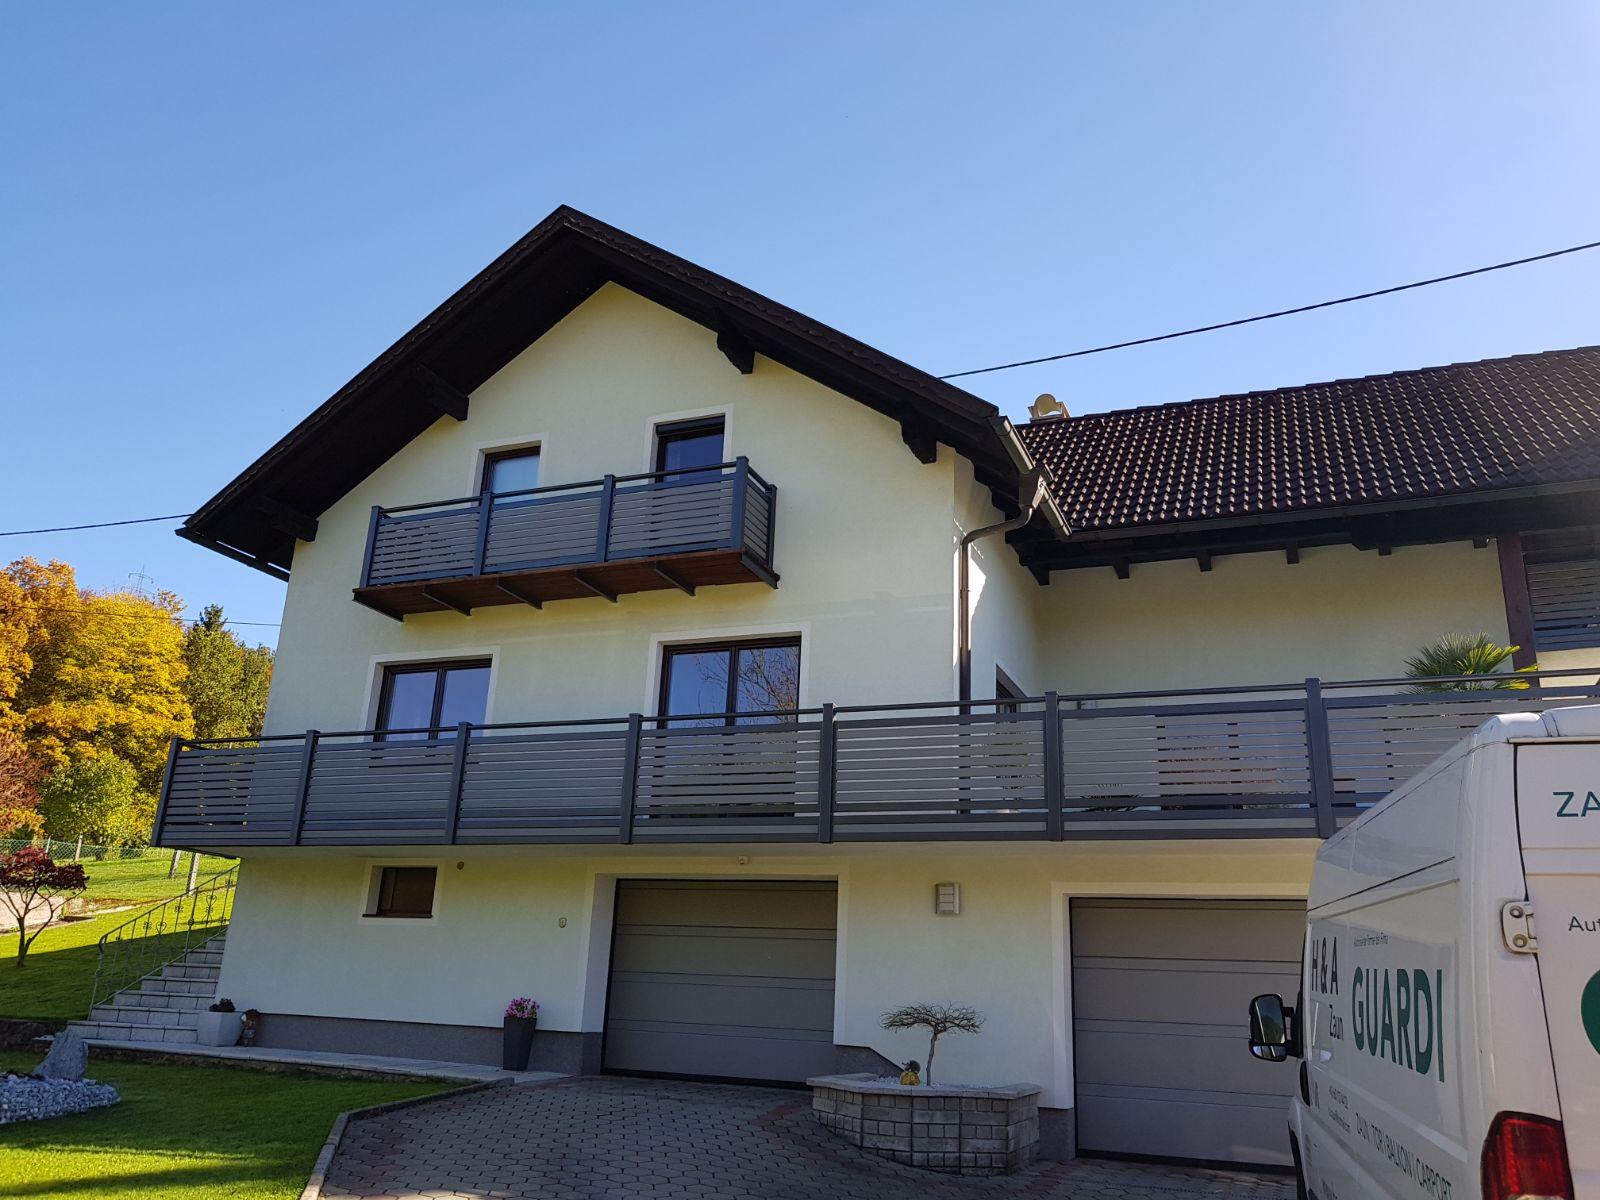 https://0501.nccdn.net/4_2/000/000/017/e75/Aluminium-Balkon-Noveao-1600x1200.jpg